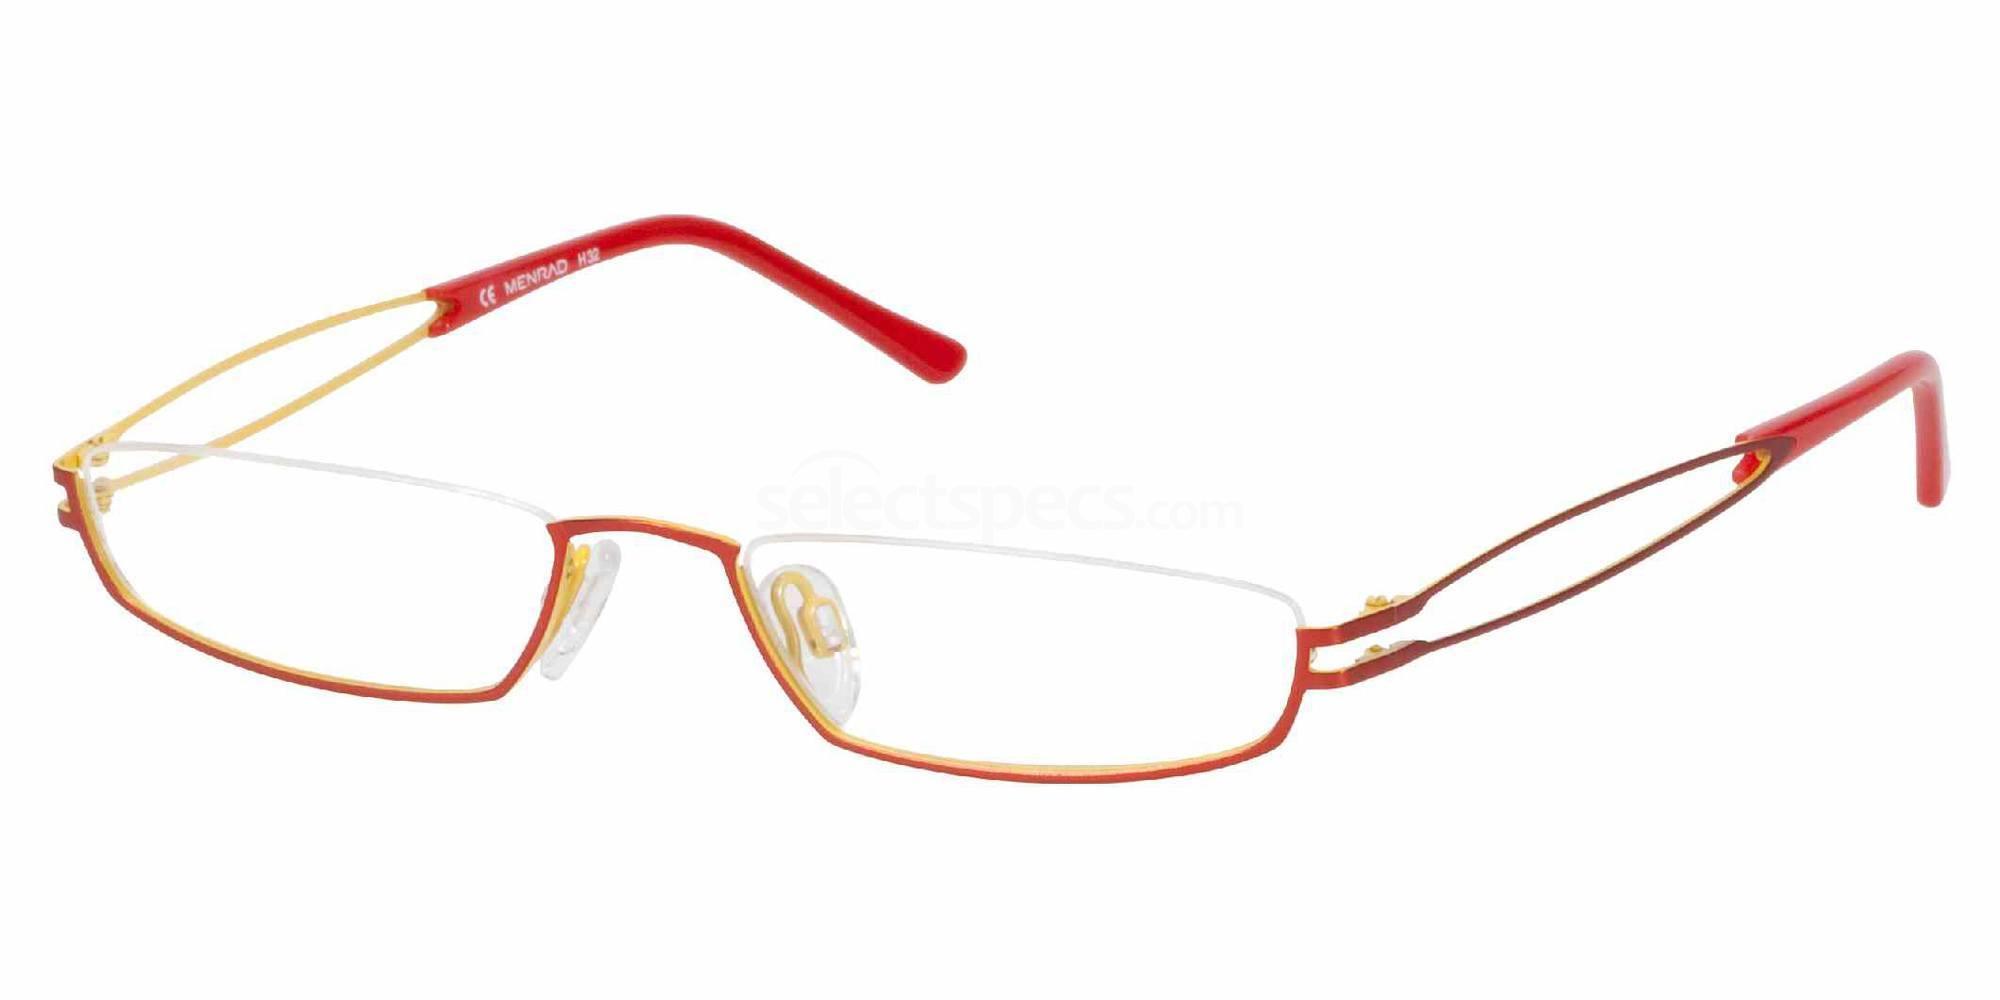 1482 13222 , MENRAD Eyewear